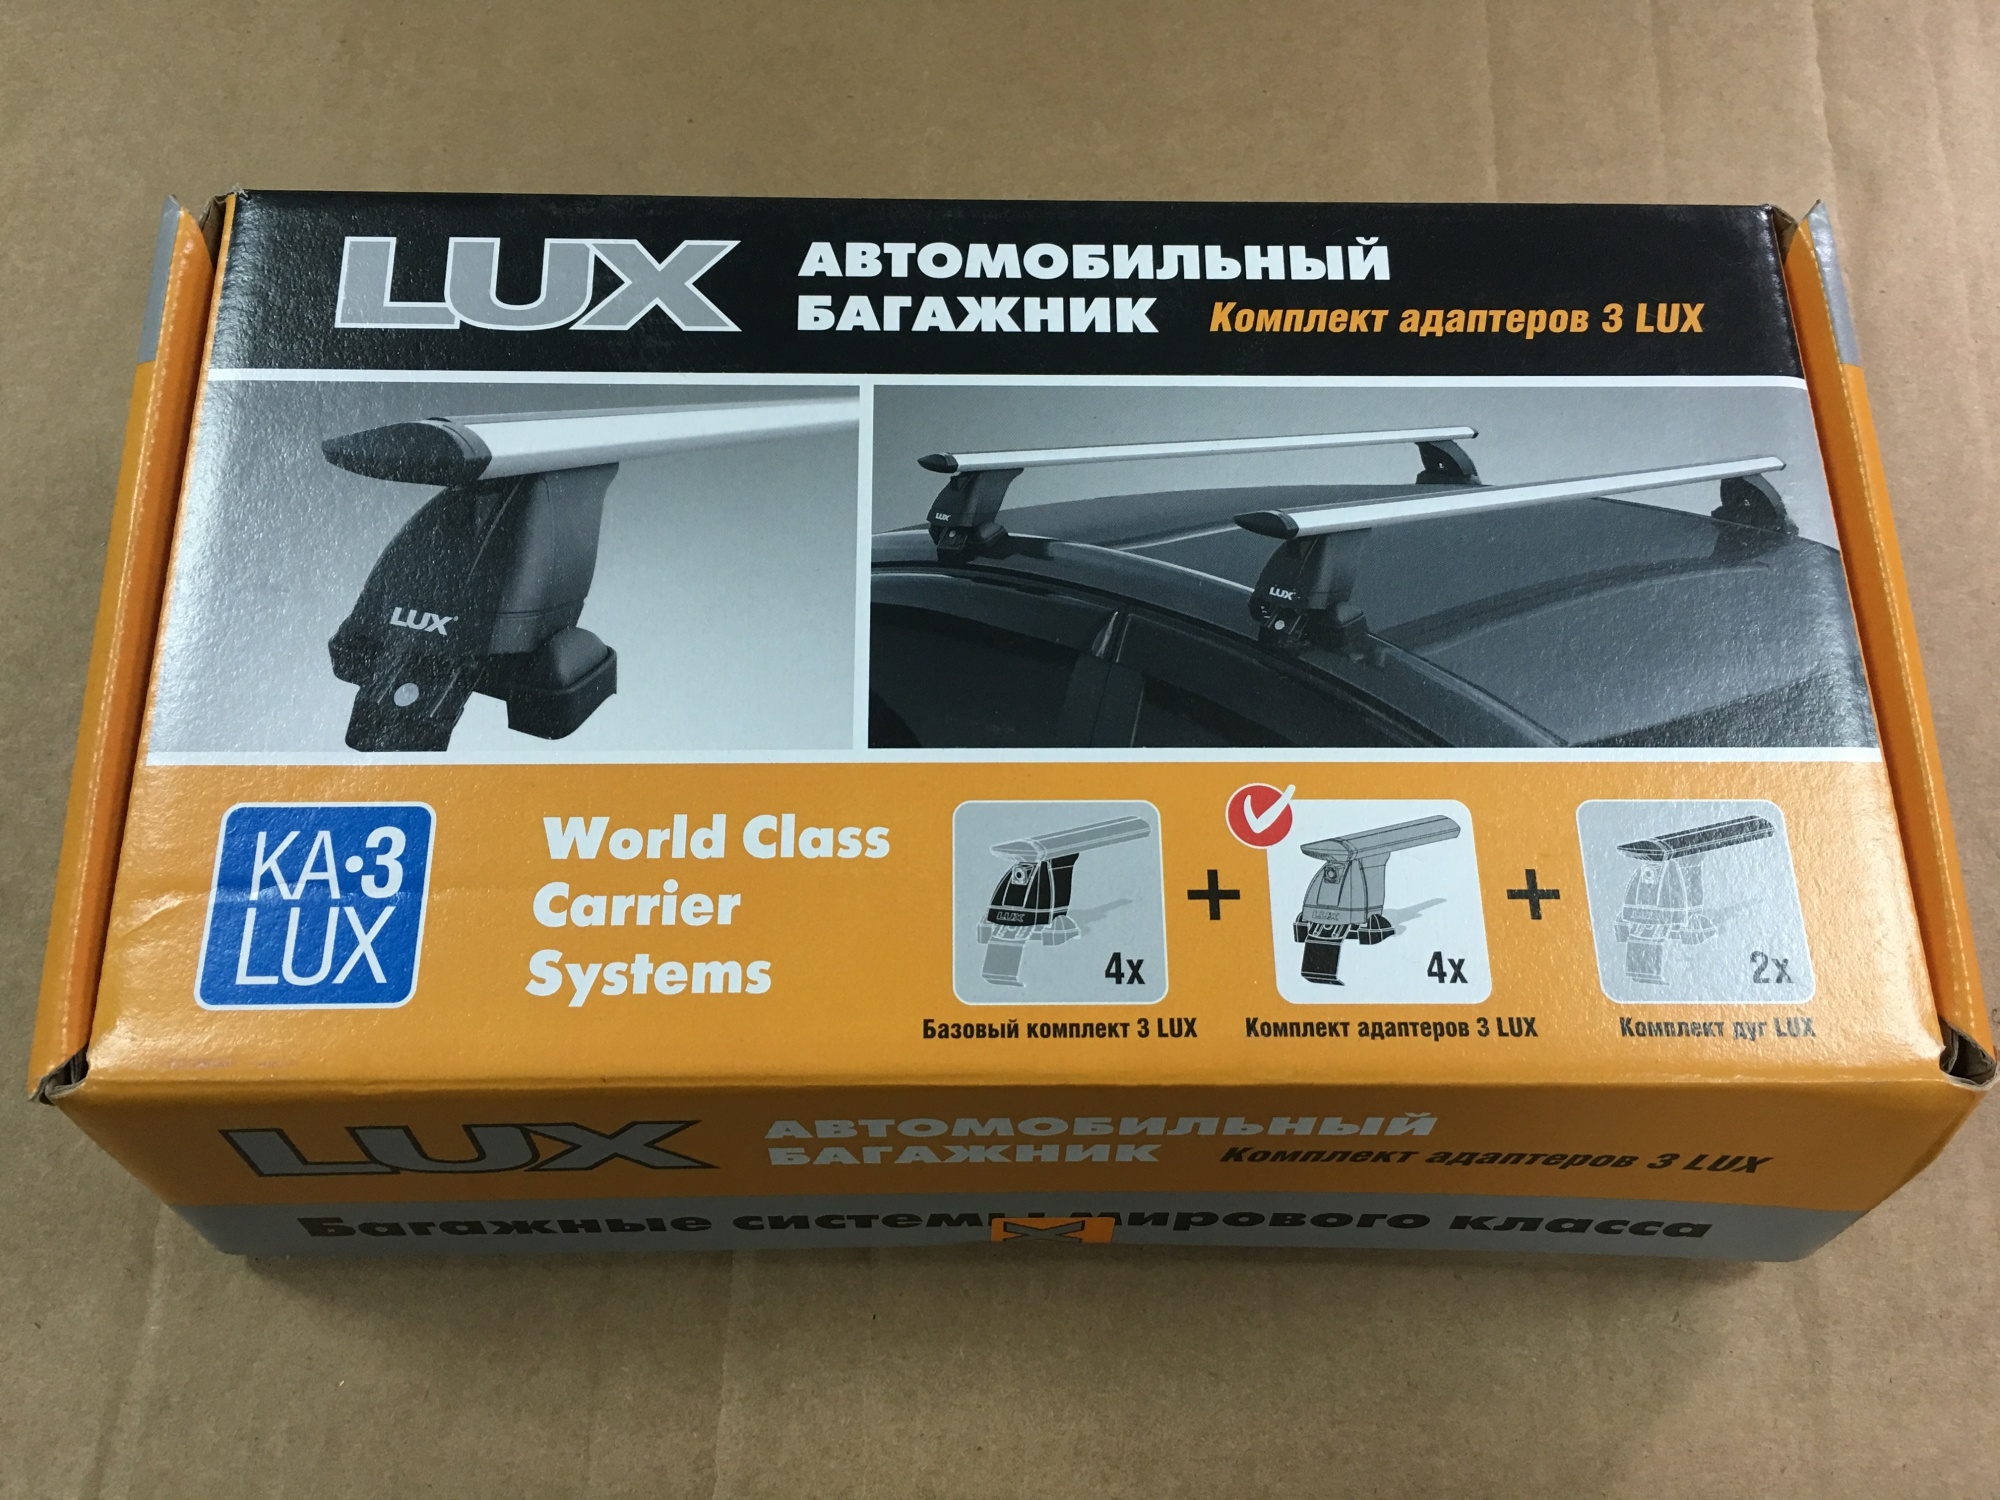 Комплект адаптеров 3 LUX Solaris17n (БК3)